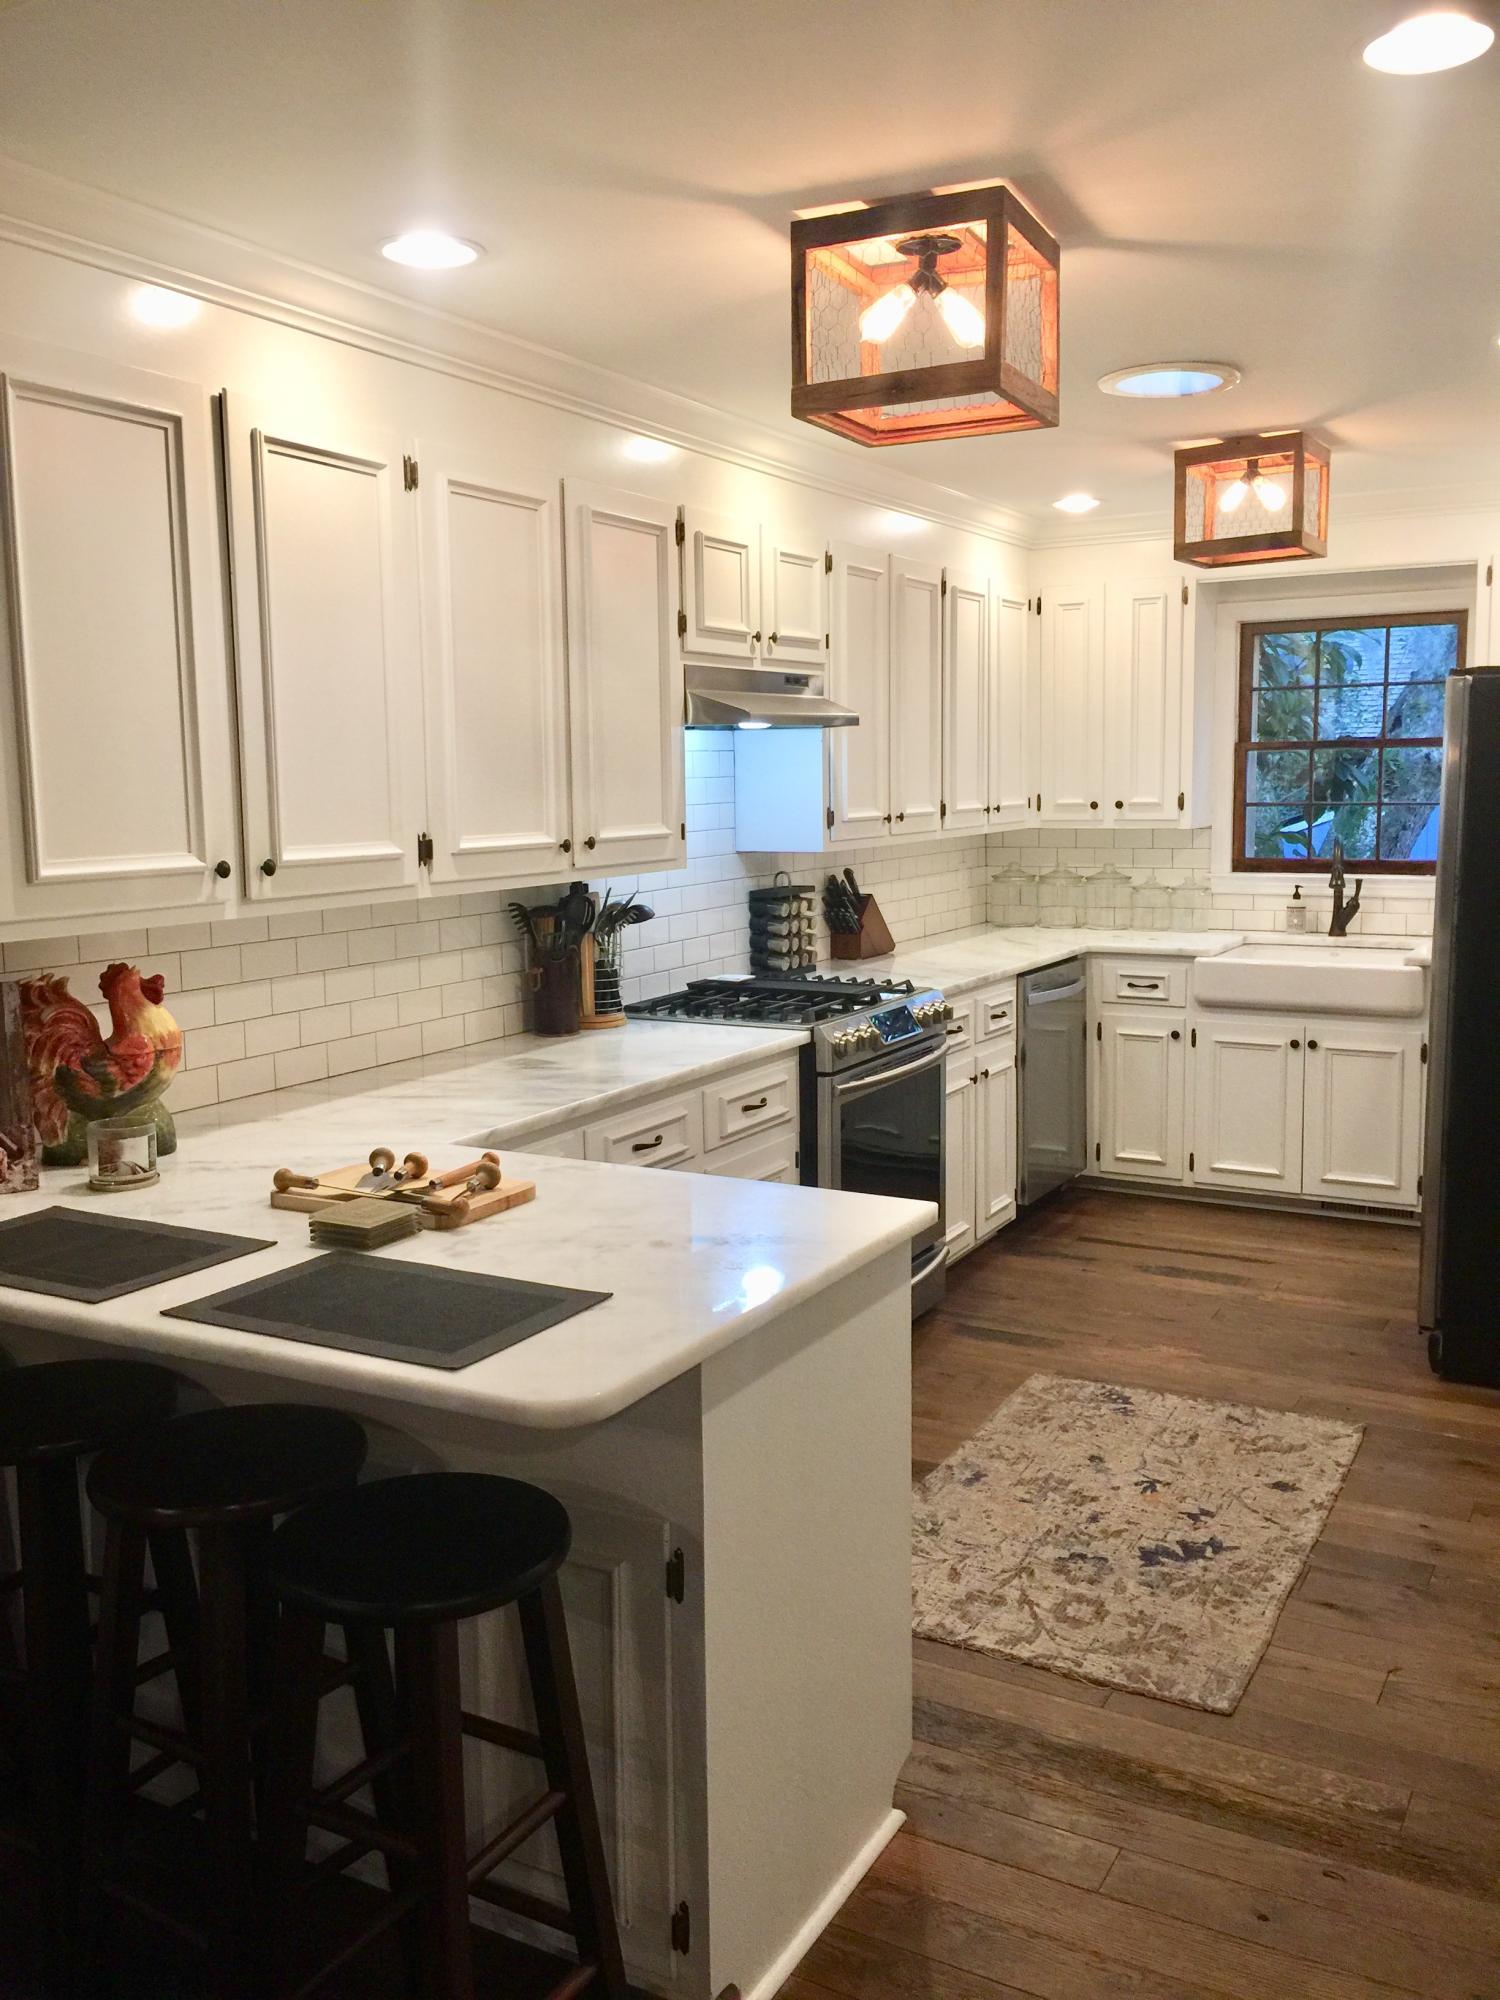 Sandhurst Homes For Sale - 3 Hampton, Charleston, SC - 5